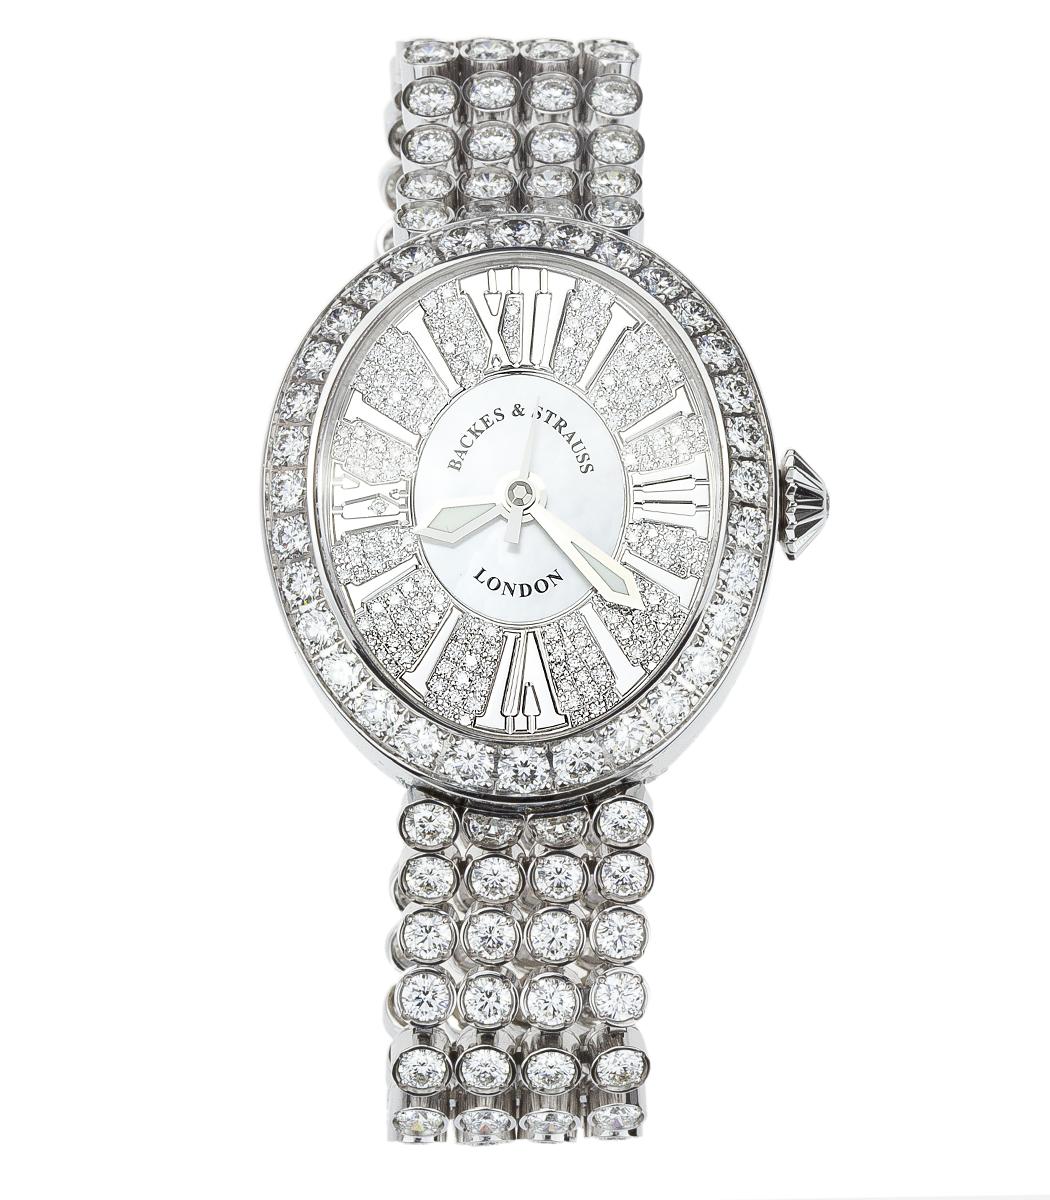 Regent Princess 3238 diamond encrusted watch for her